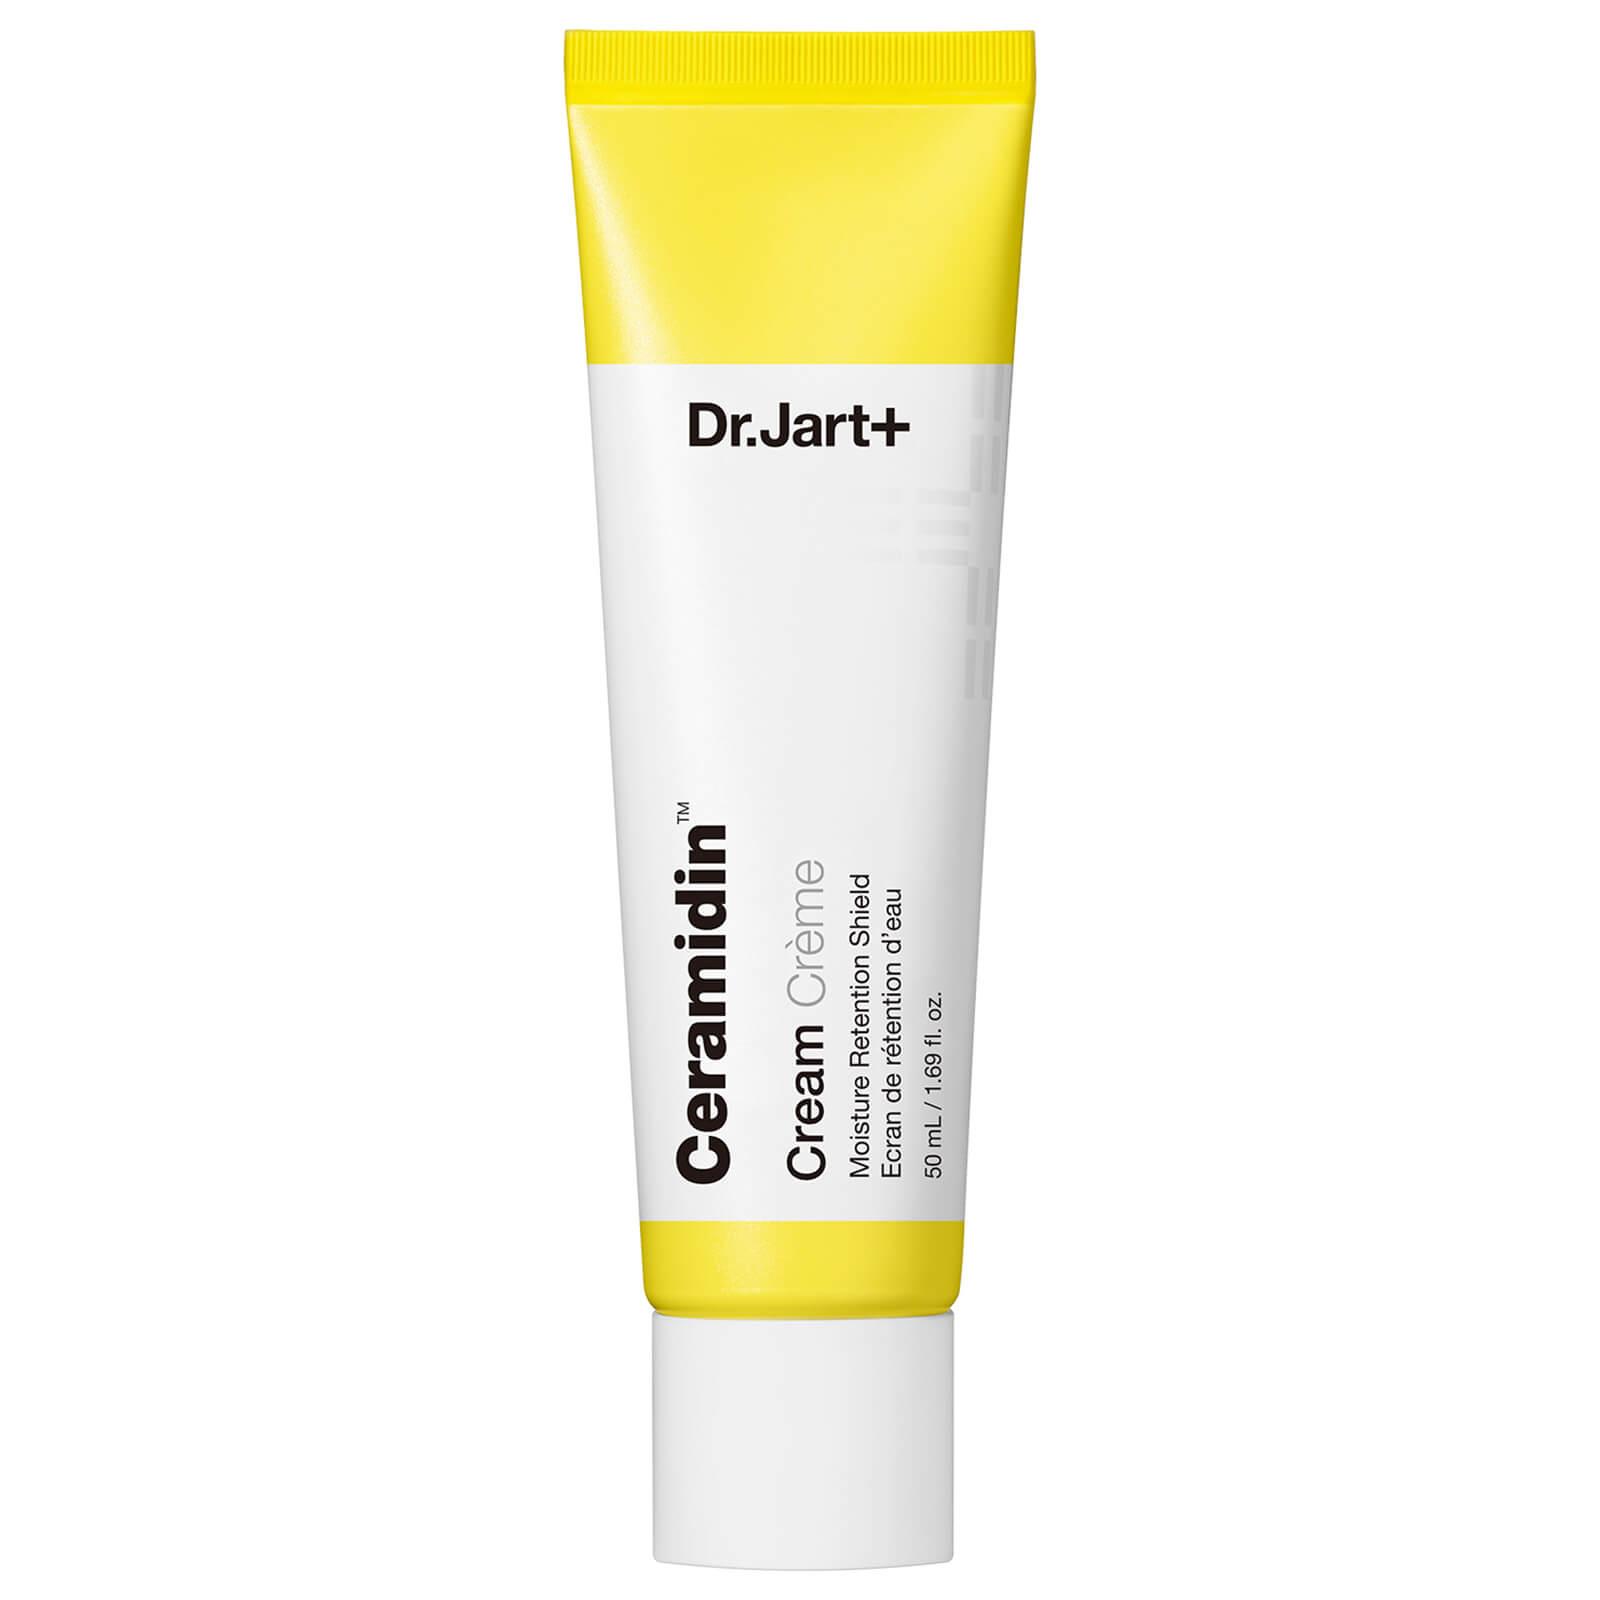 Dr.Jart+ Ceramidin Cream 50ml